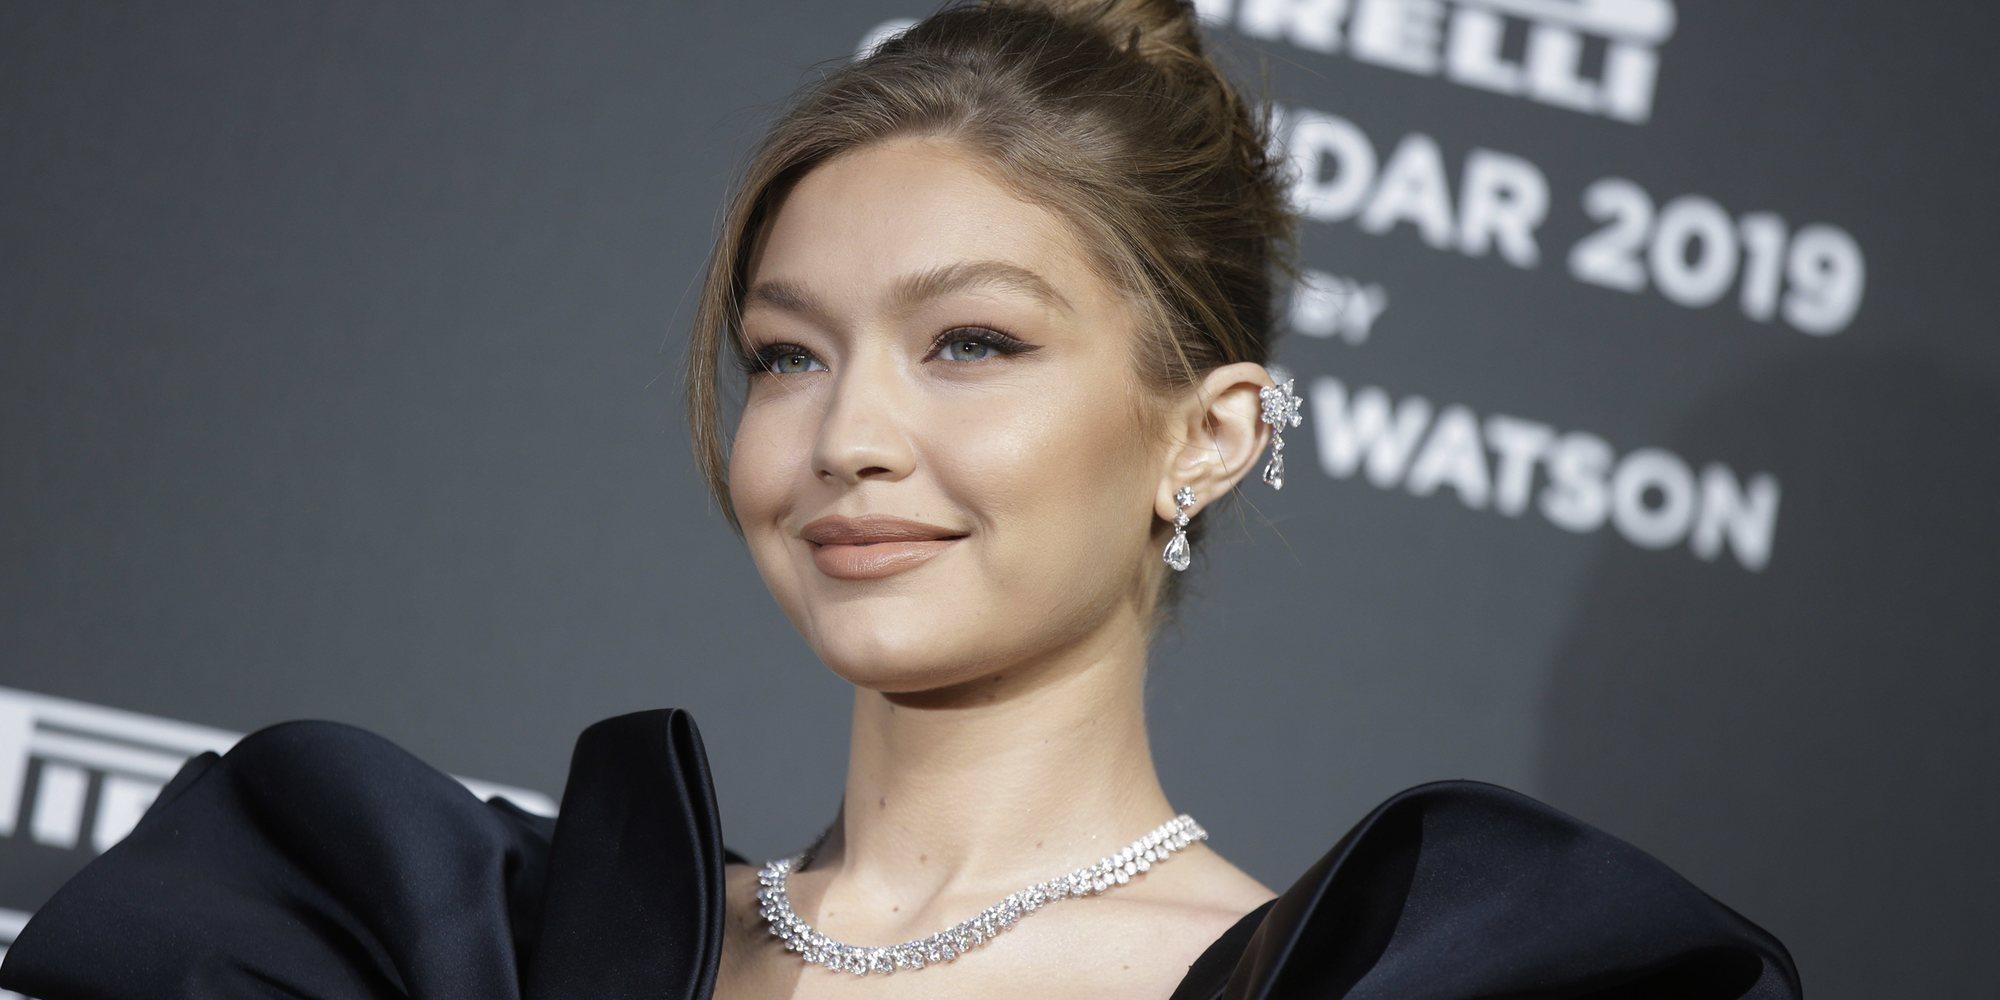 'Hola, nieta': Mohamed Hadid siembra la duda sobre si Gigi Hadid ha da ya a luz a su primer hijo